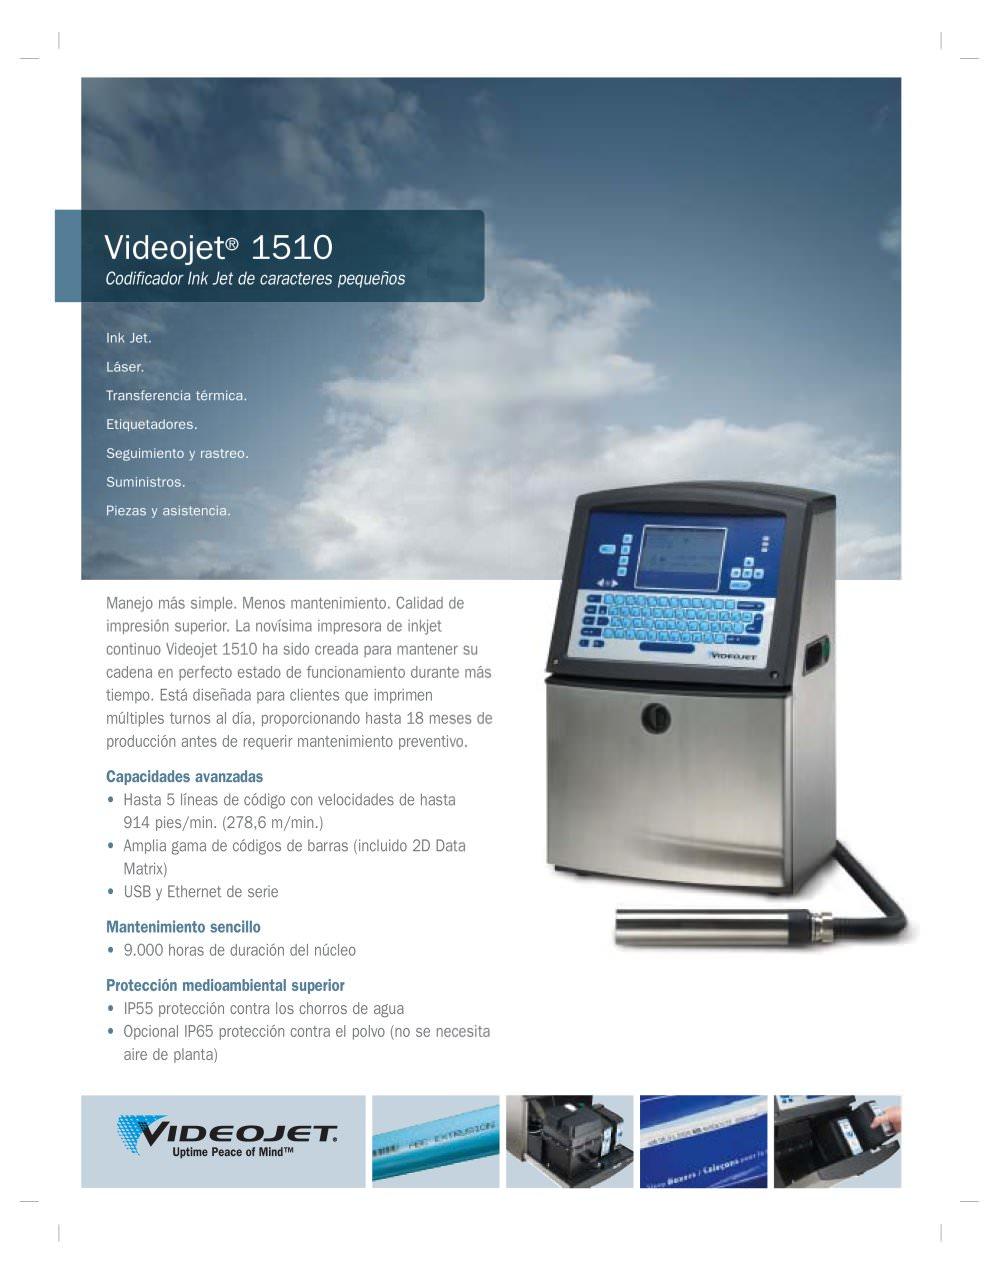 VJ 1510 espanol - 1 / 2 Pages